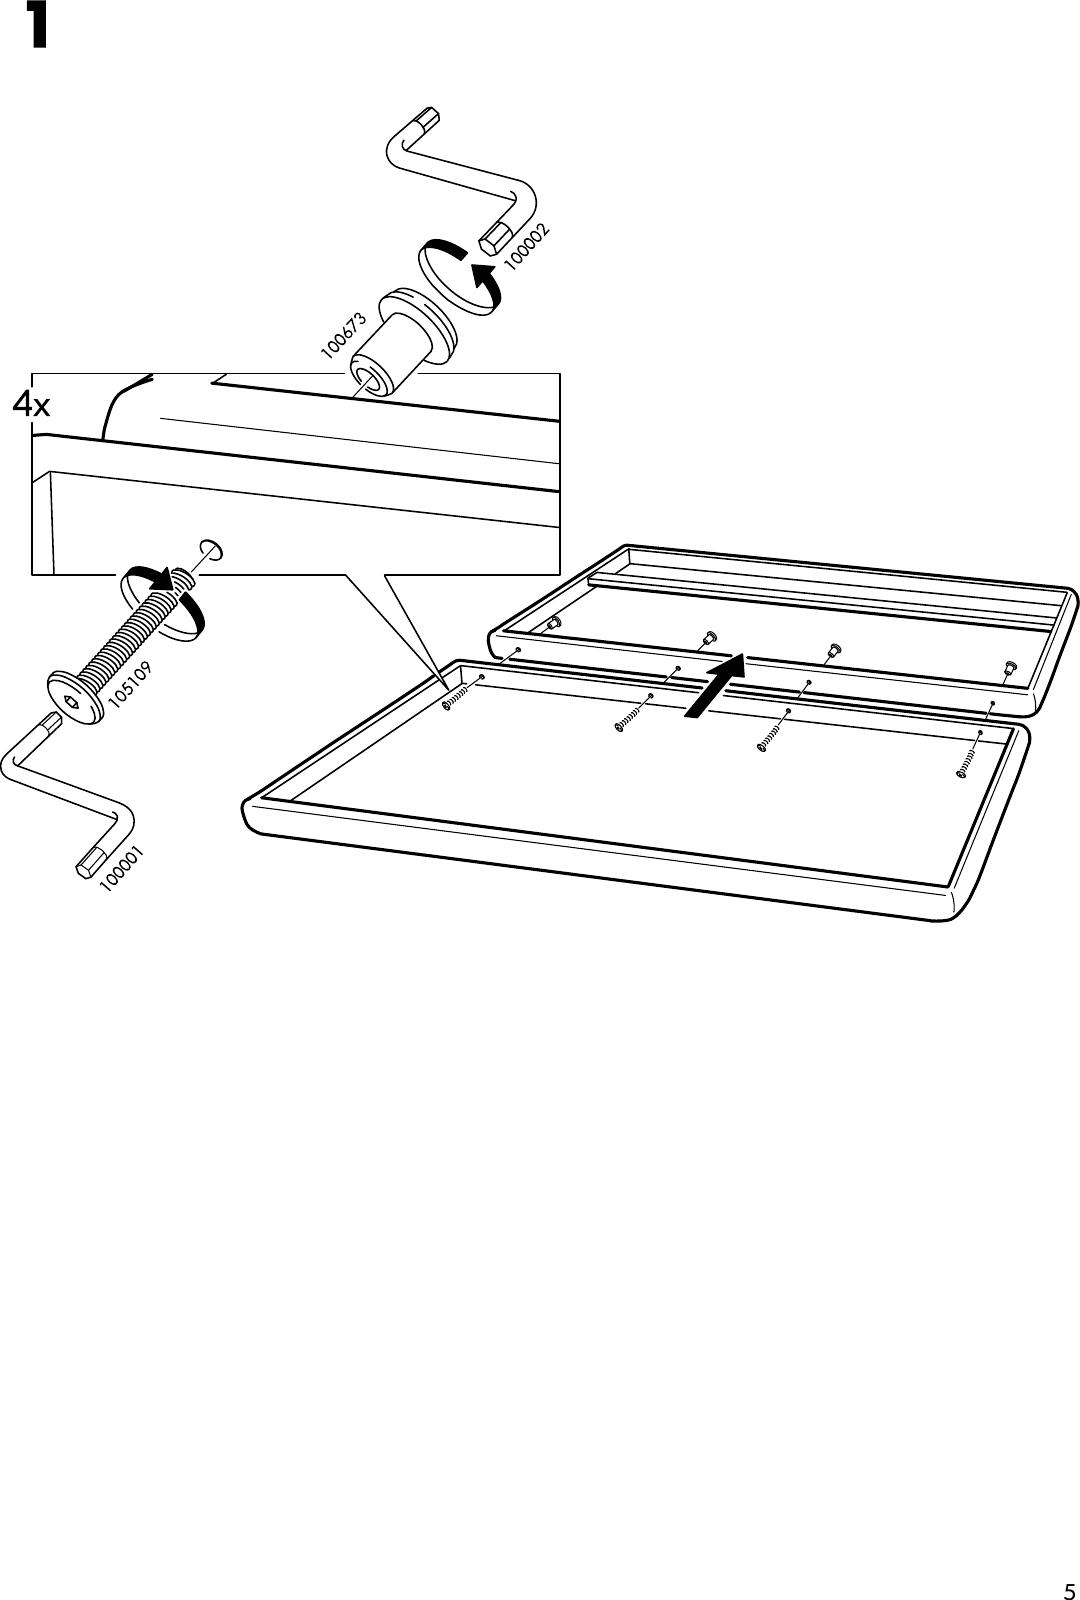 Ikea Badalen Wall Mounted Headboard Assembly Instruction